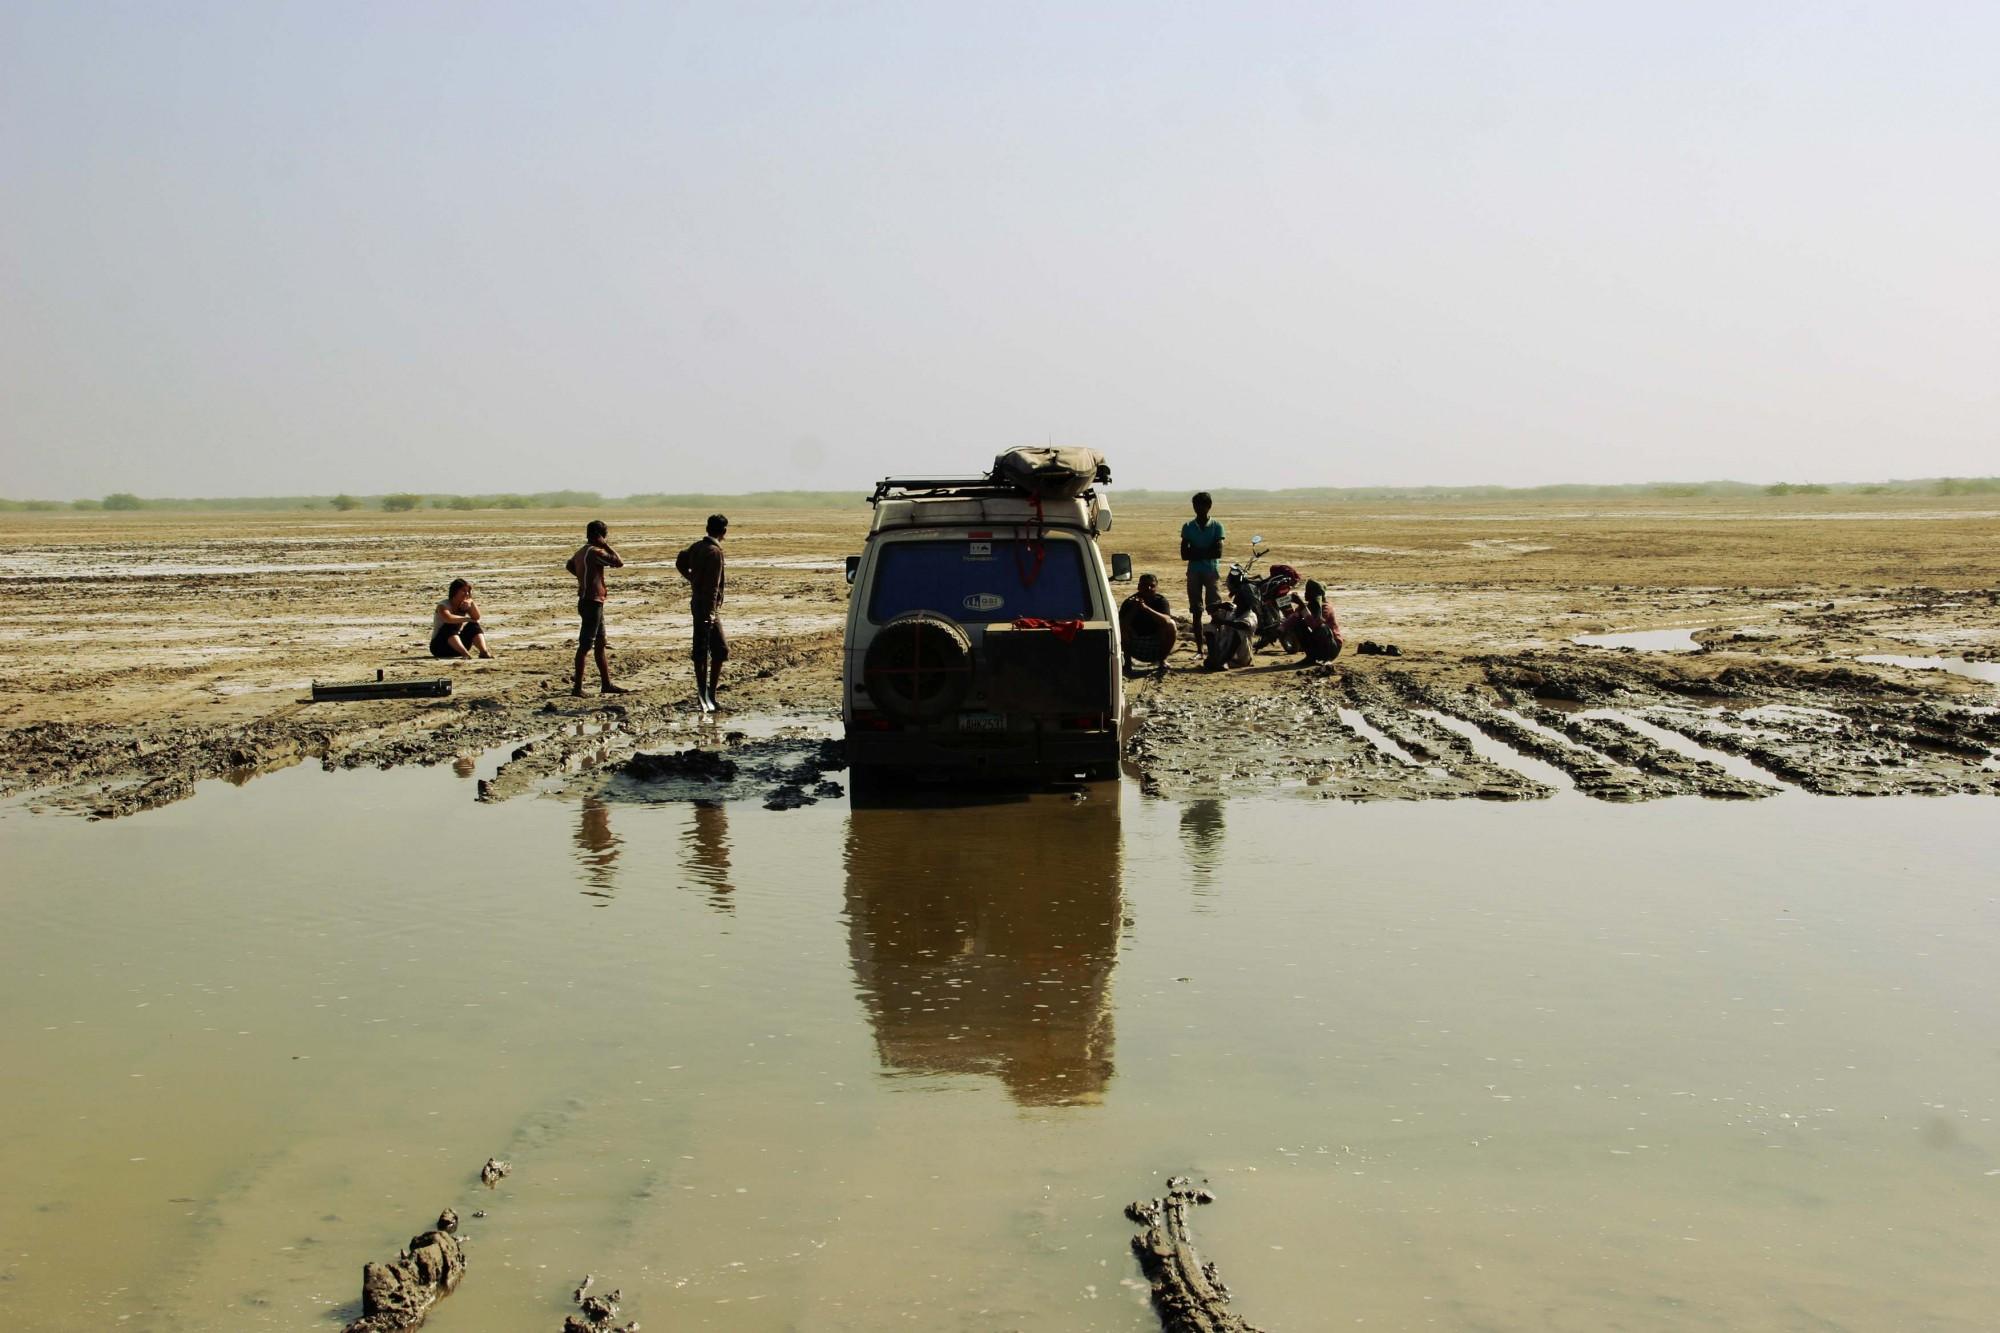 Stuck in the clay on the Pakistani border in Gujarat, India